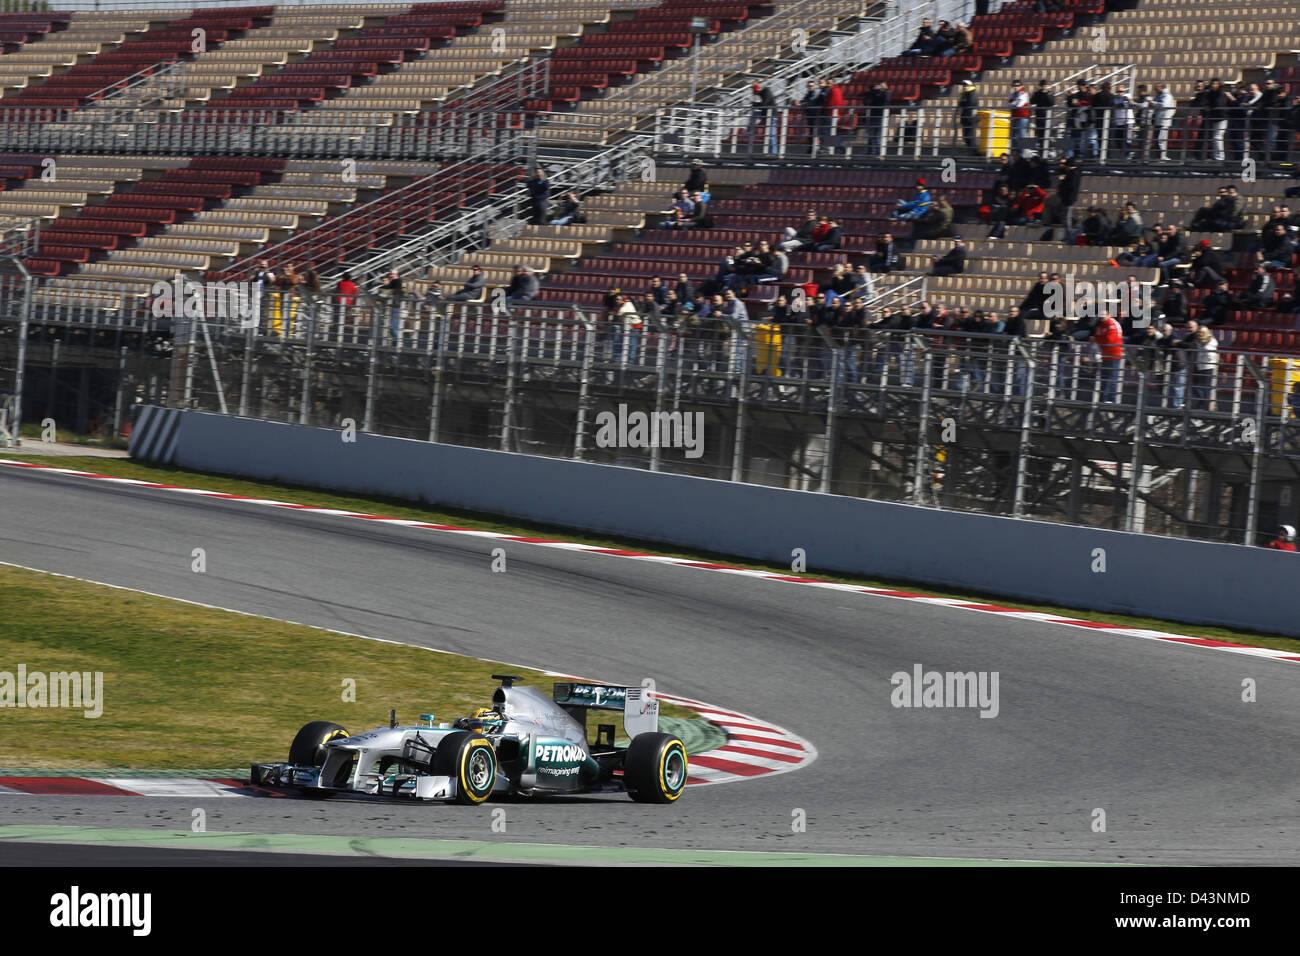 Motorsports: FIA Formula One World Championship 2013, Tests in Barcelona, Lewis Hamilton (GER, Mercedes AMG Petronas - Stock Image